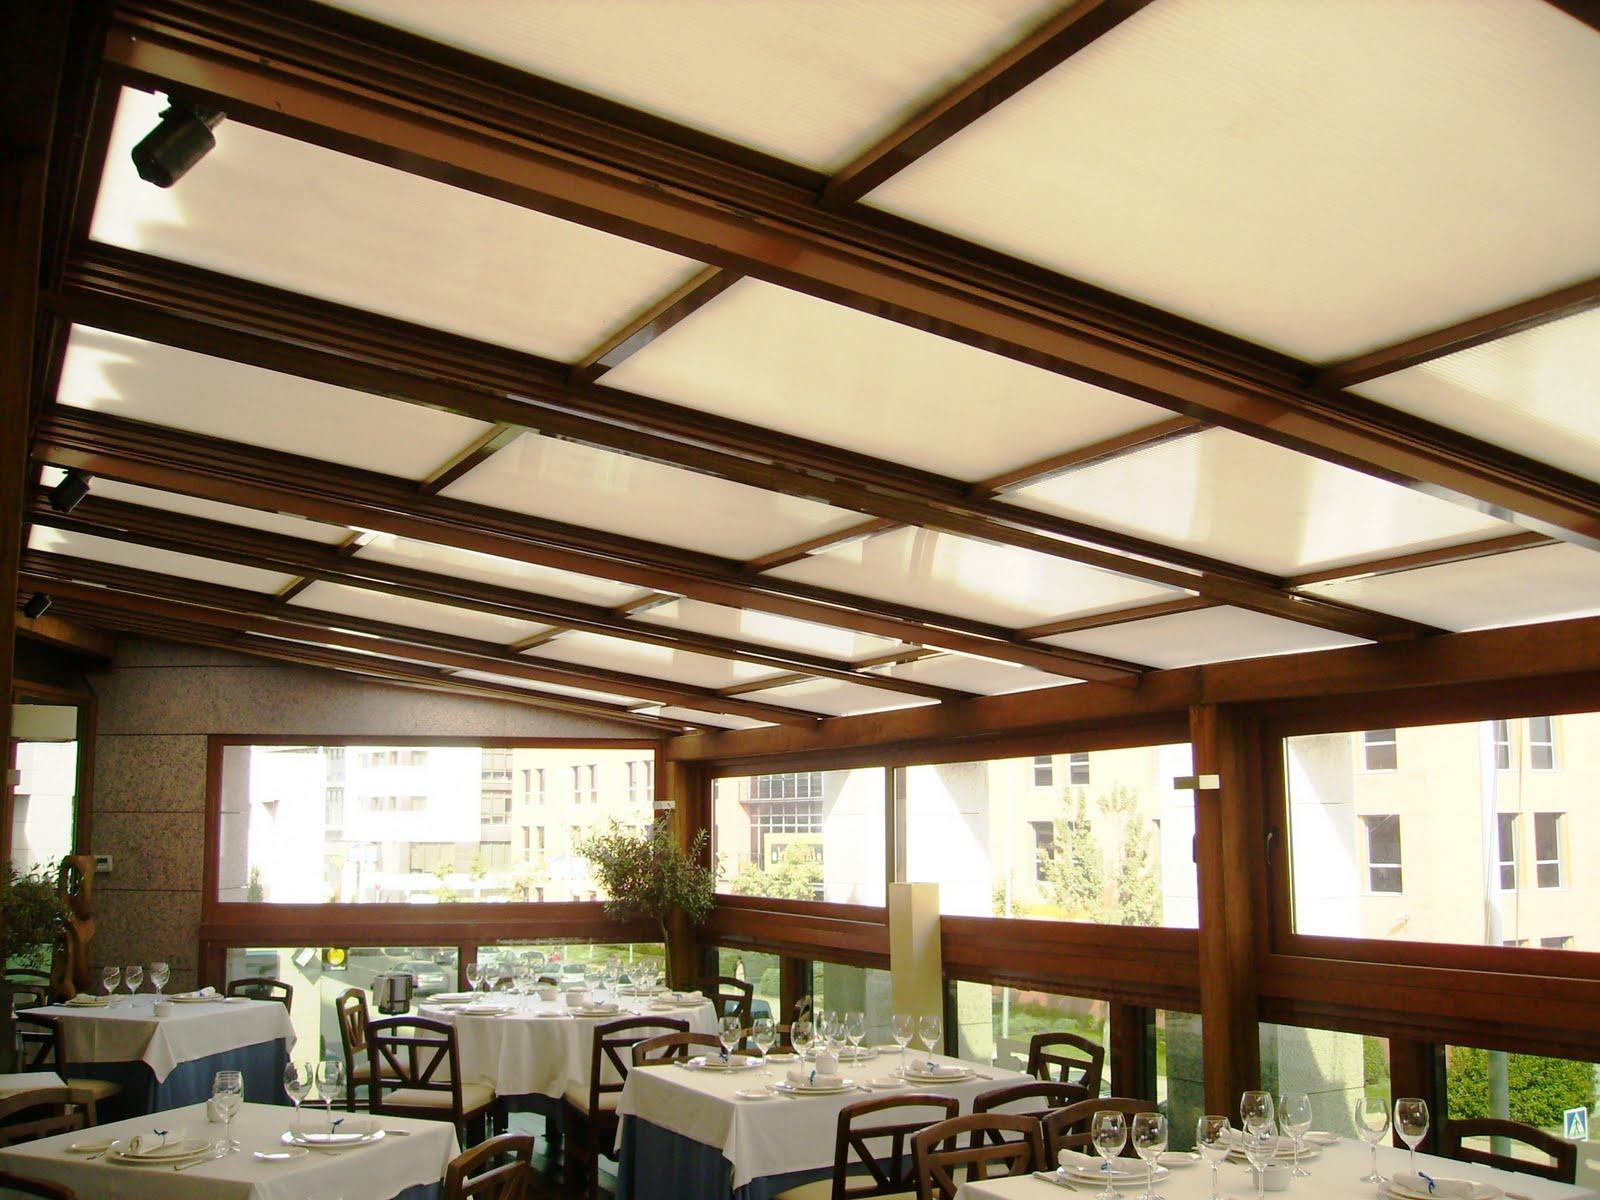 Techos para ampliacion restaurante cerramientos para for Modelos de gibson para techos